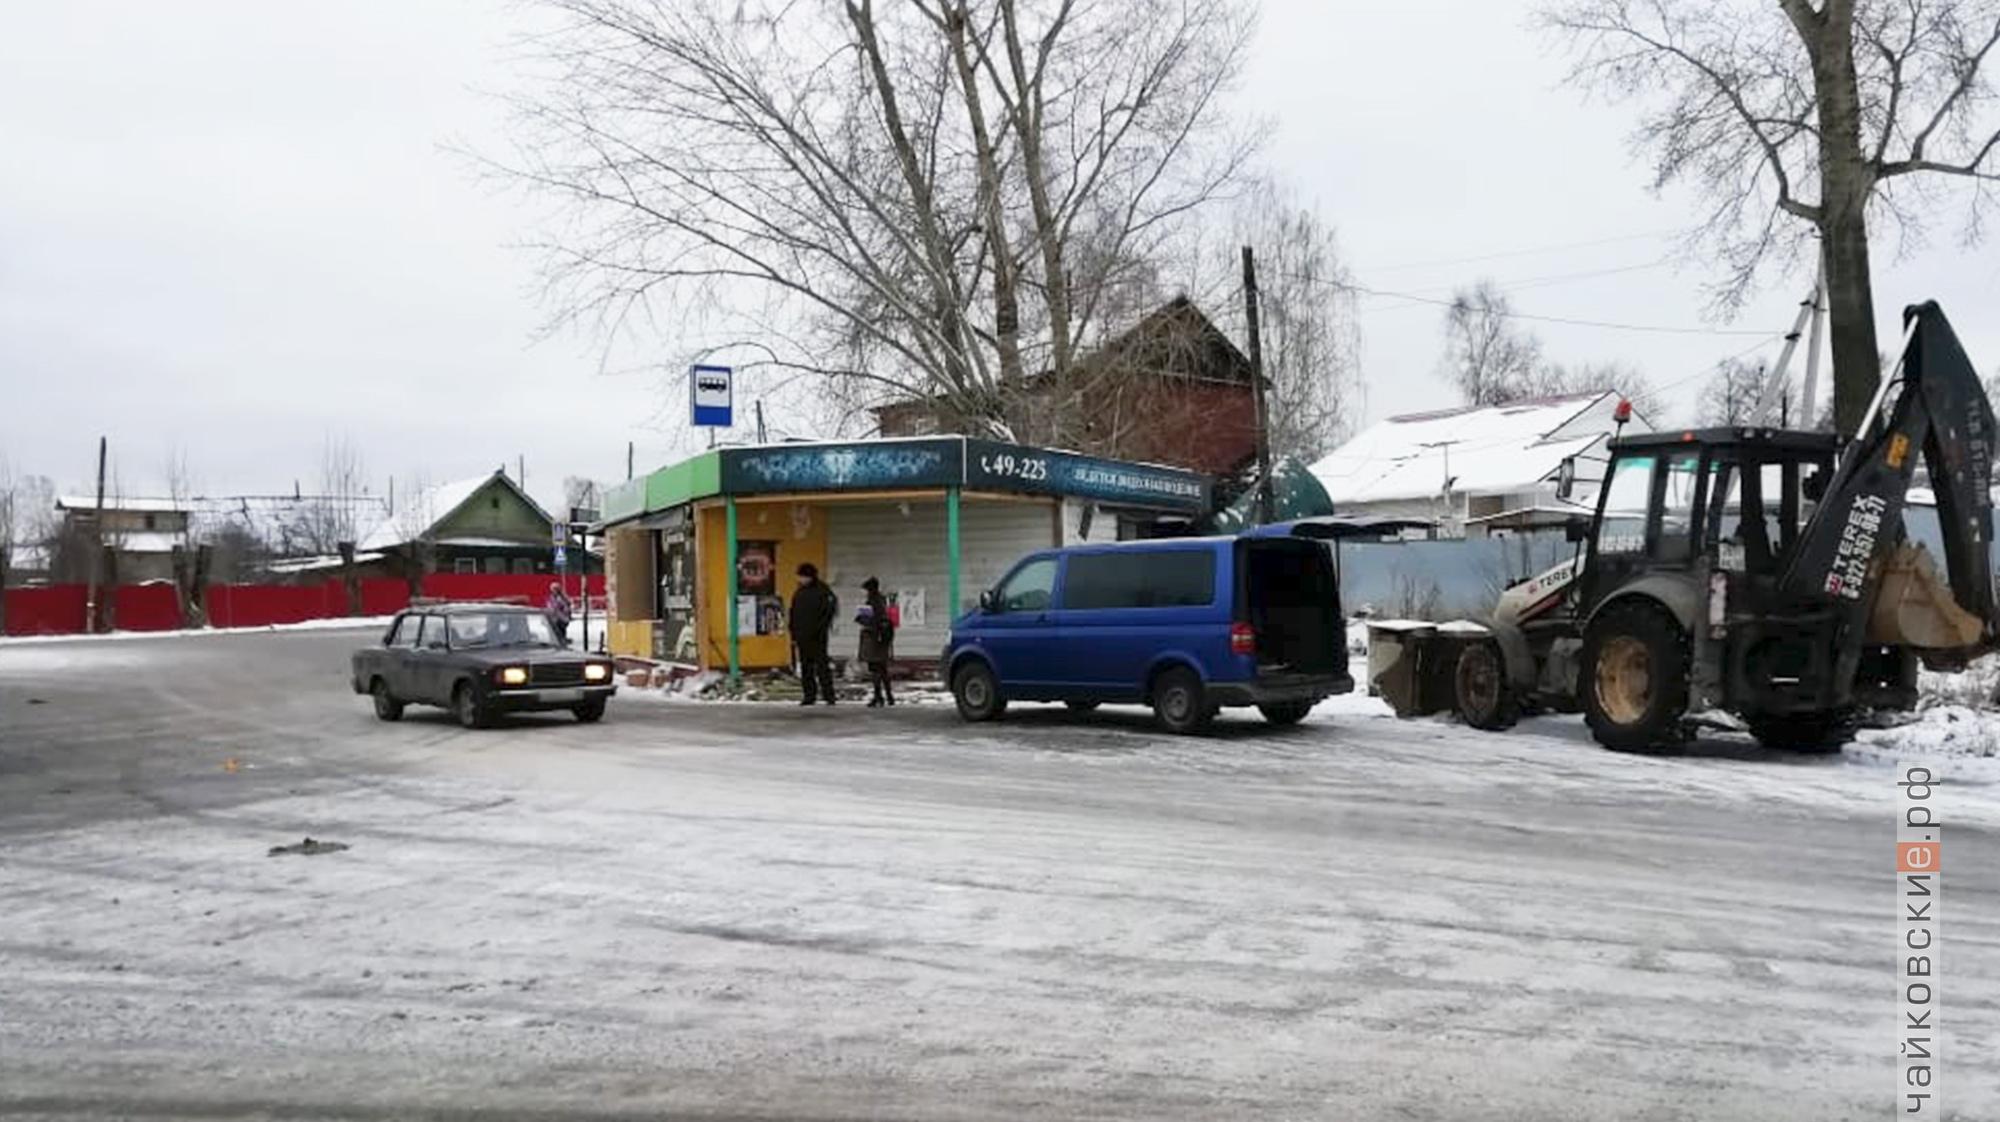 снос магазина, чайковский район, 2019 год